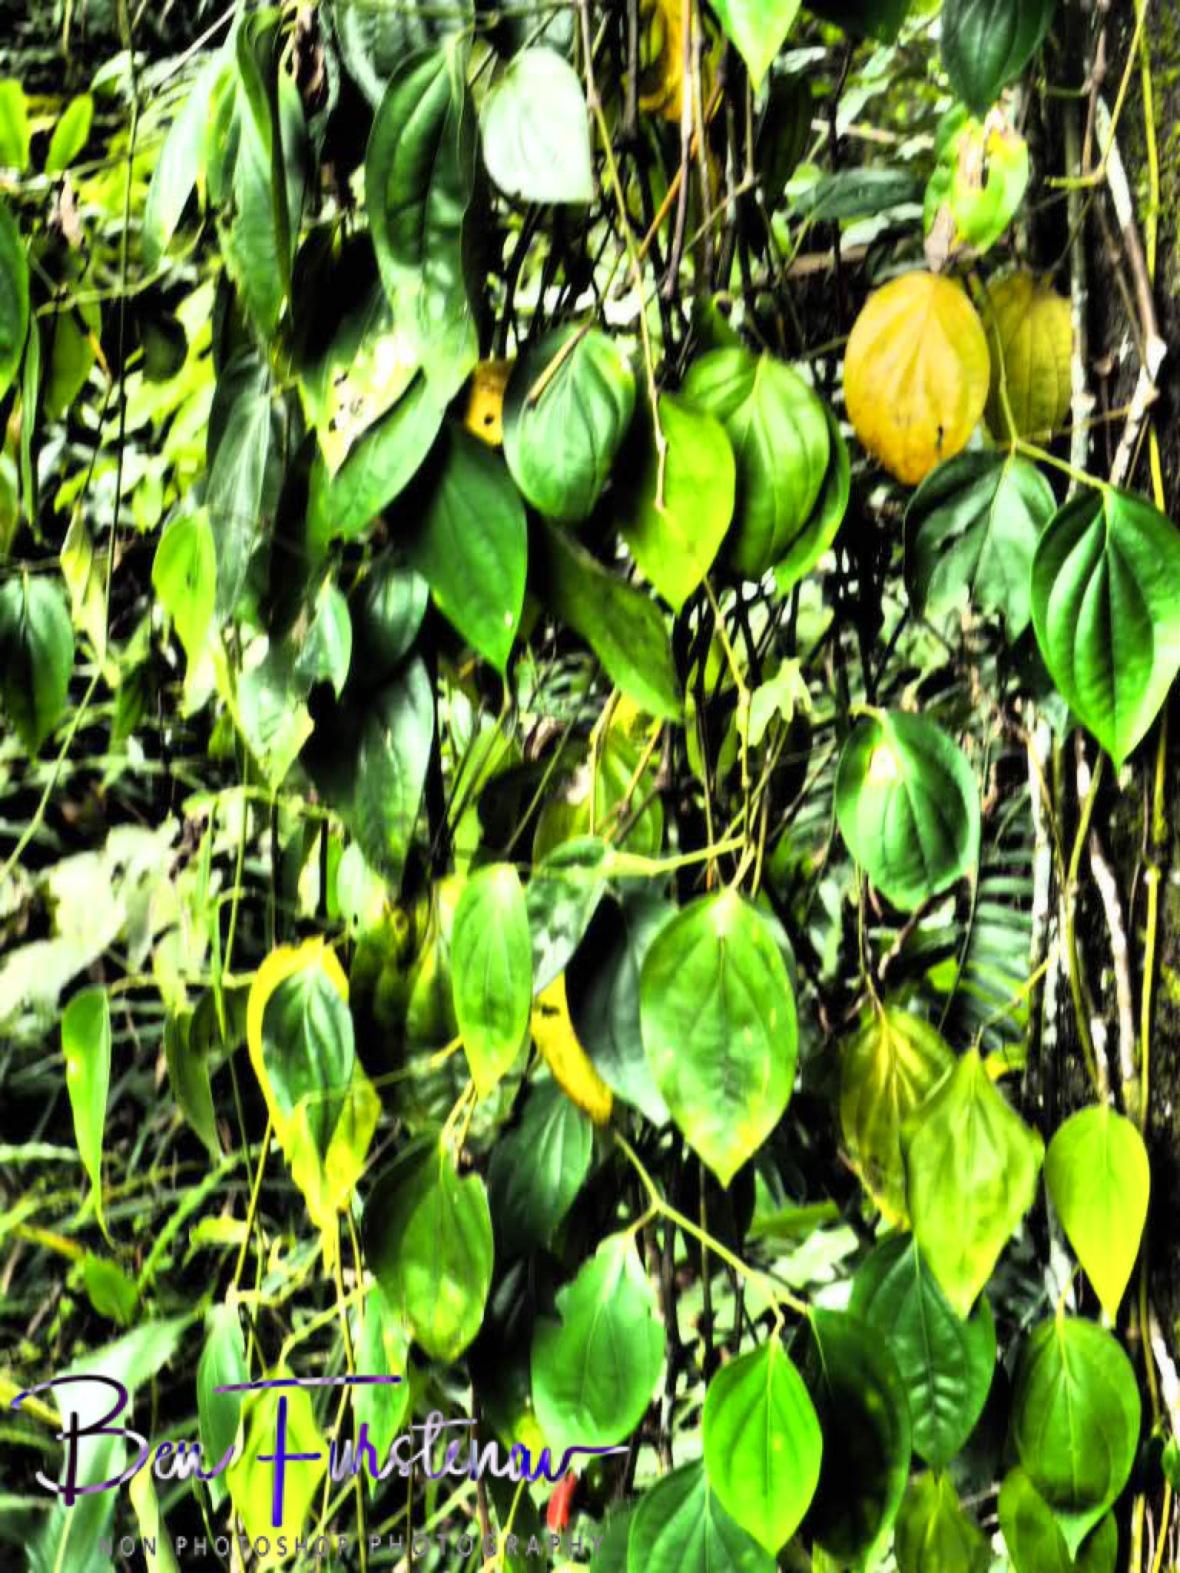 Leafy display at Babinda, Tropical Northern Queensland, Australia